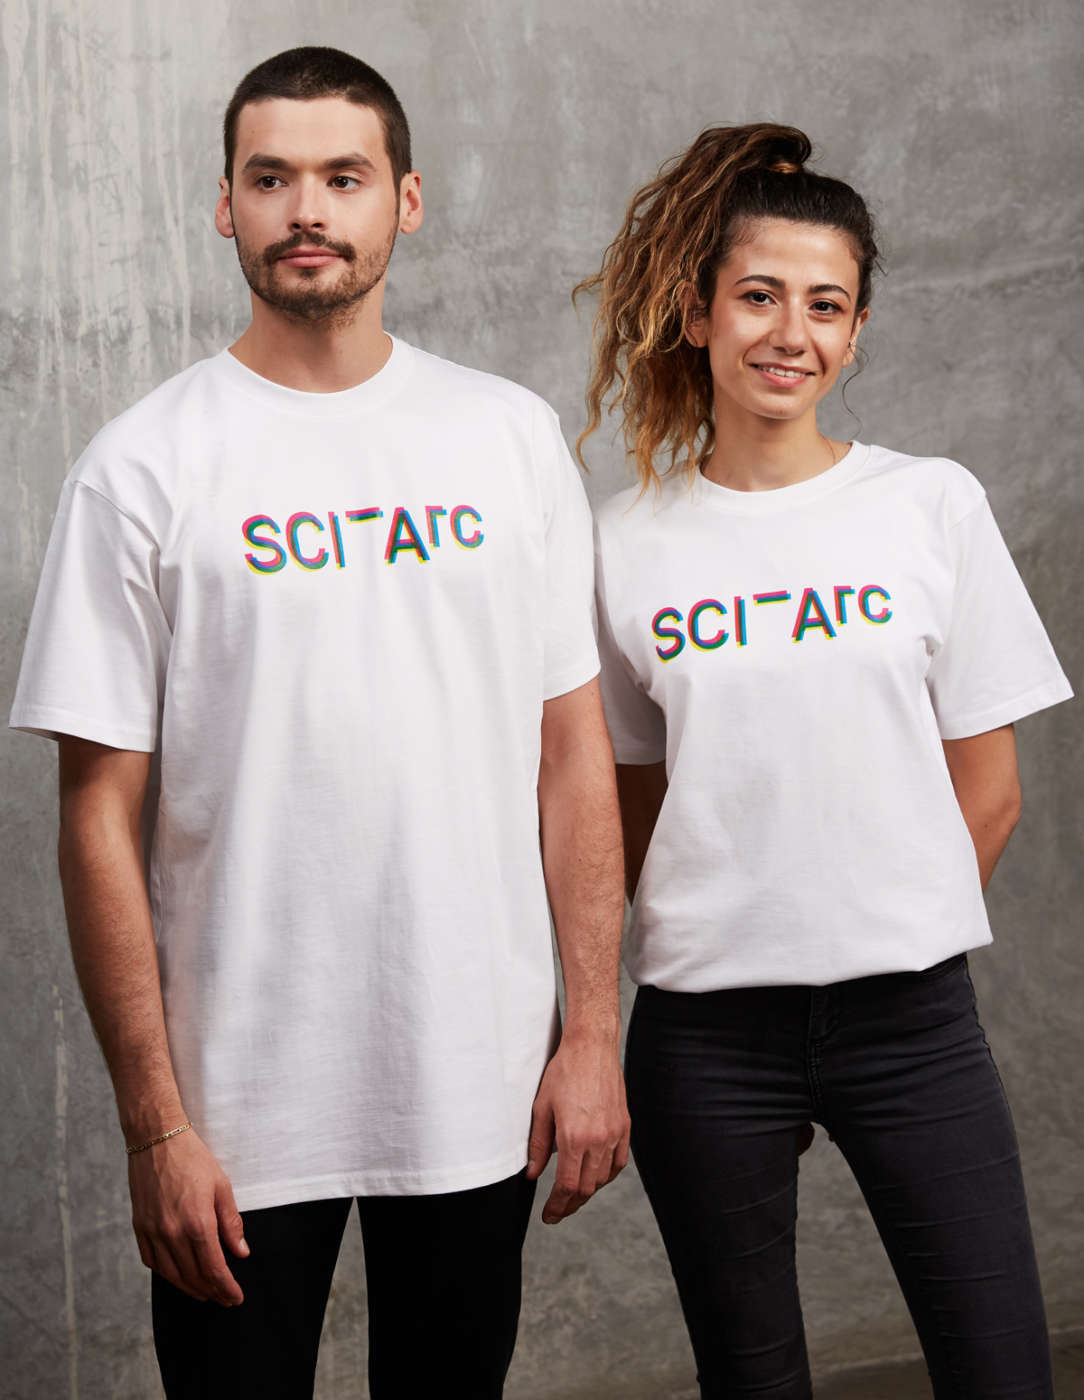 3D sciarc logo t shirt